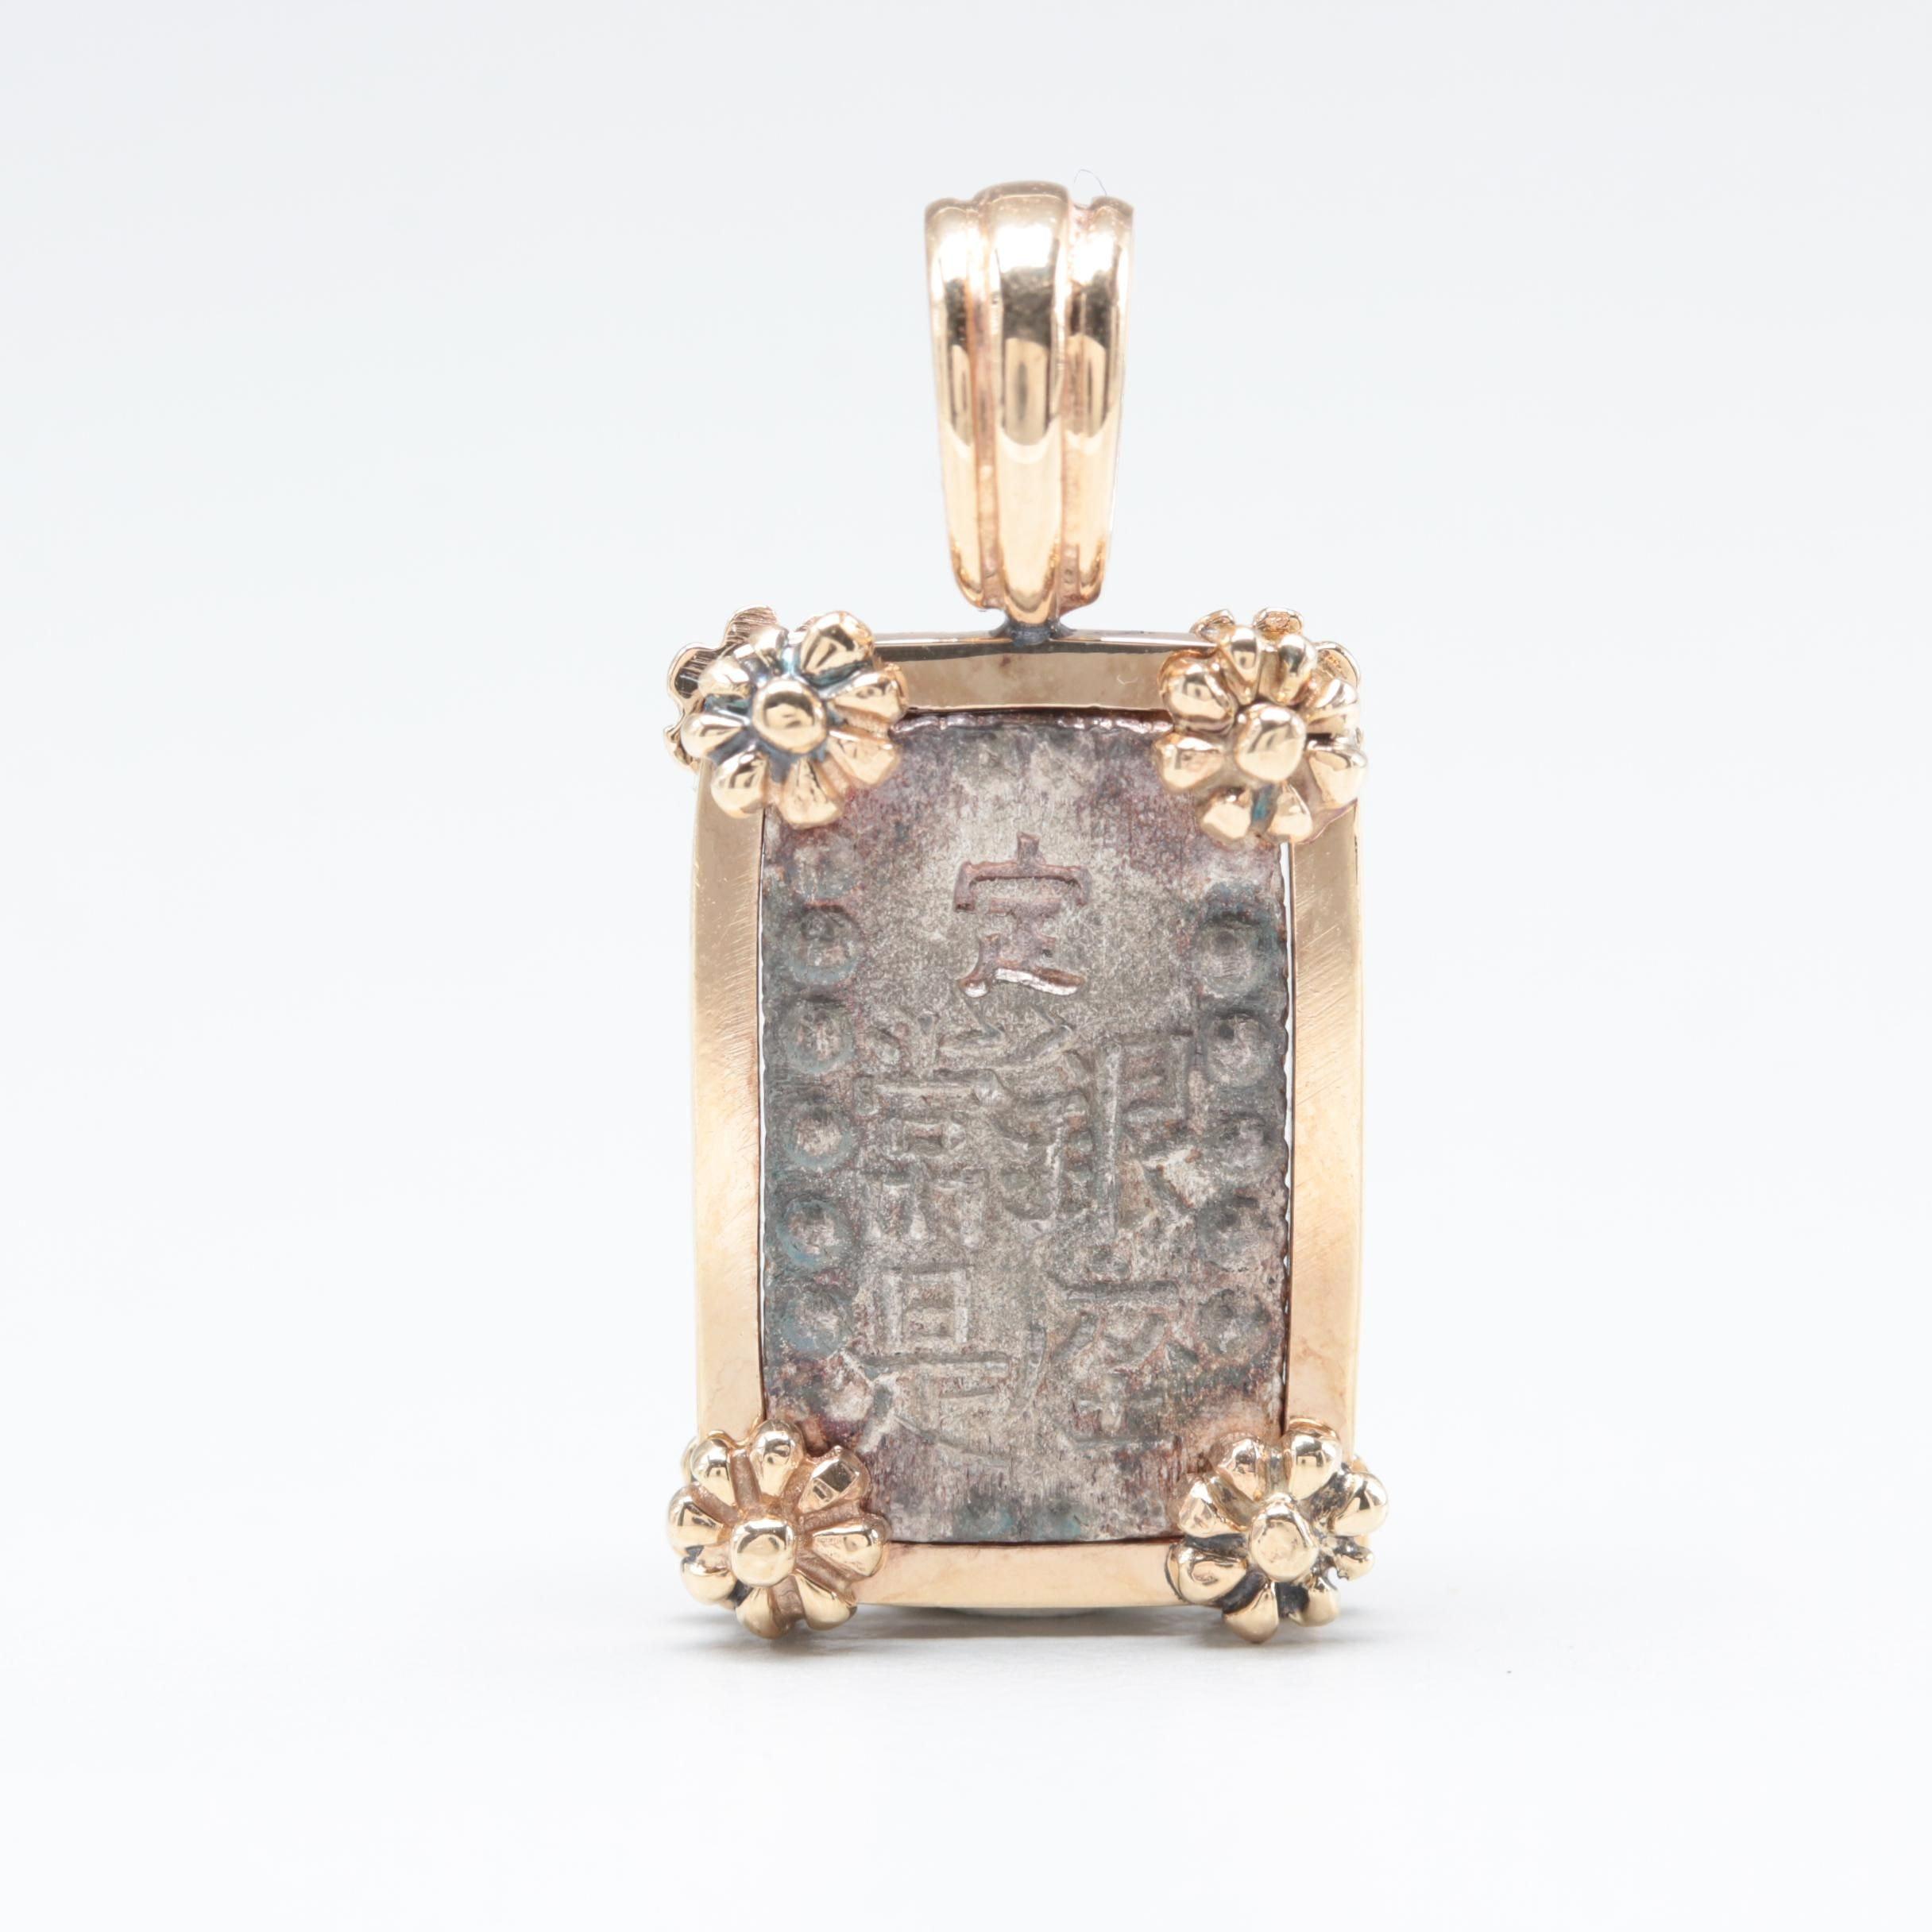 14K Yellow Gold Pendant With a Circa 1824 - 1869 Japanese 900 Silver Shu Coin